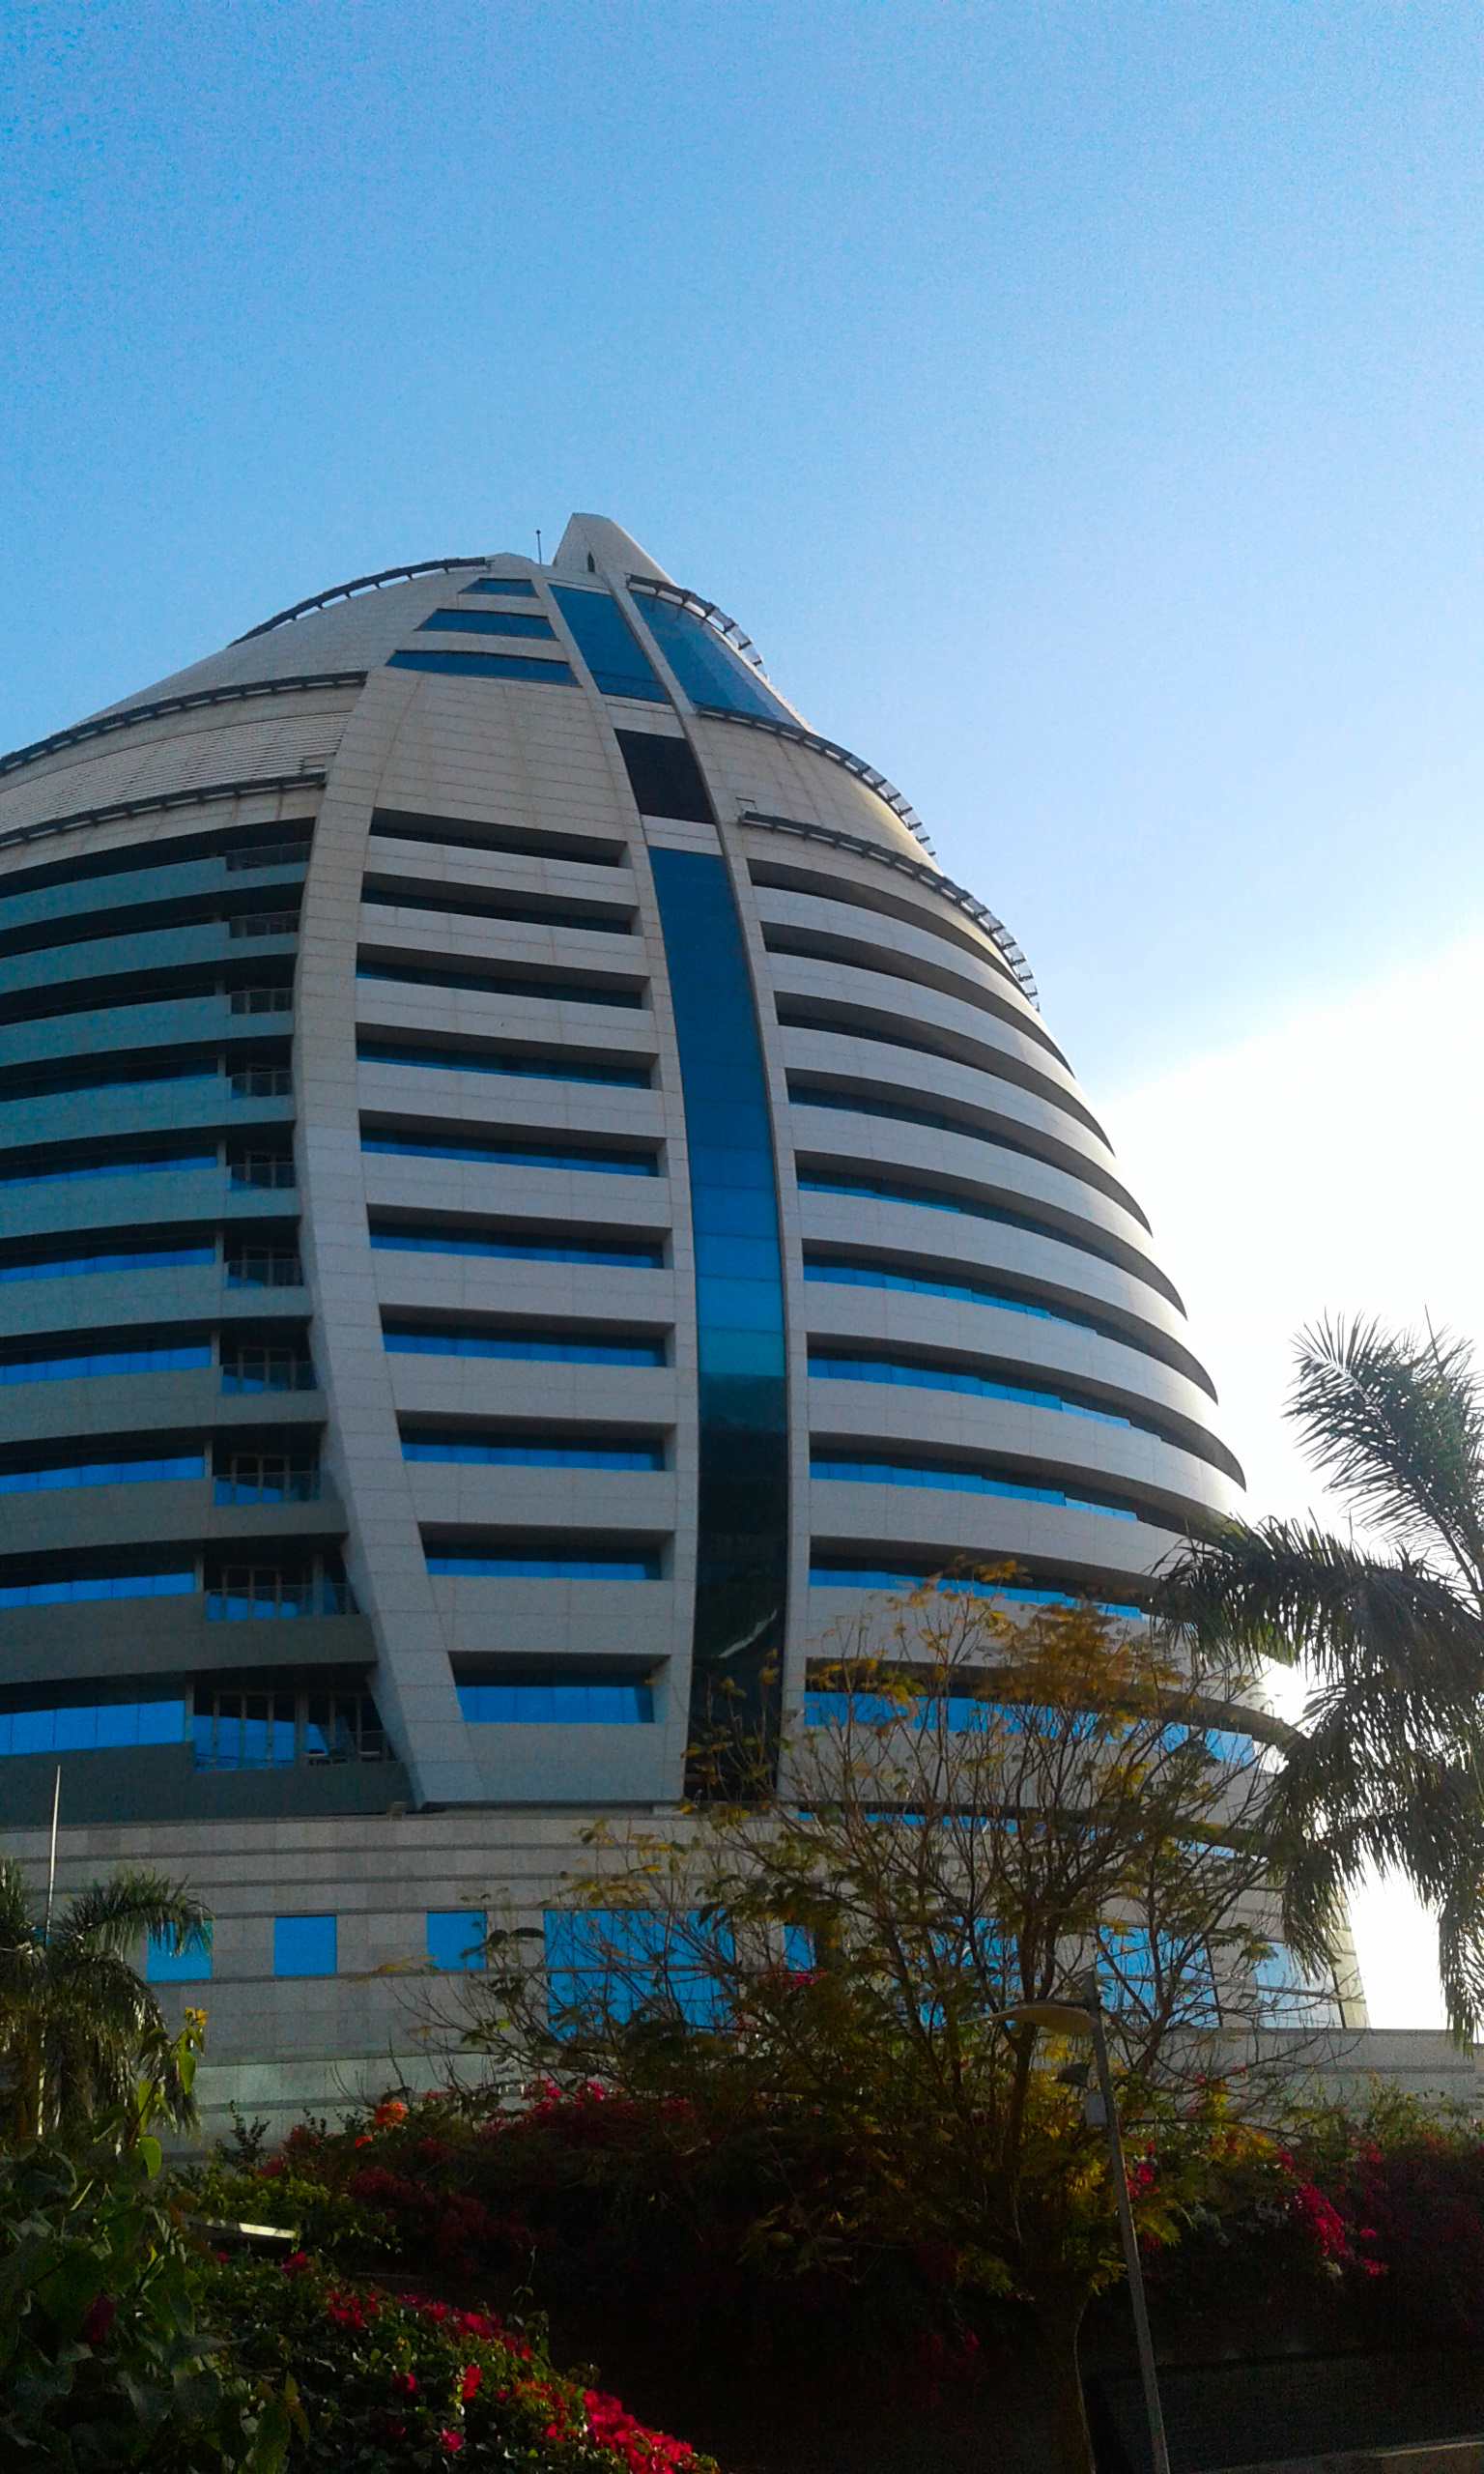 Khartoum's Corinthia hotel, or Gaddafi's egg if you prefer...